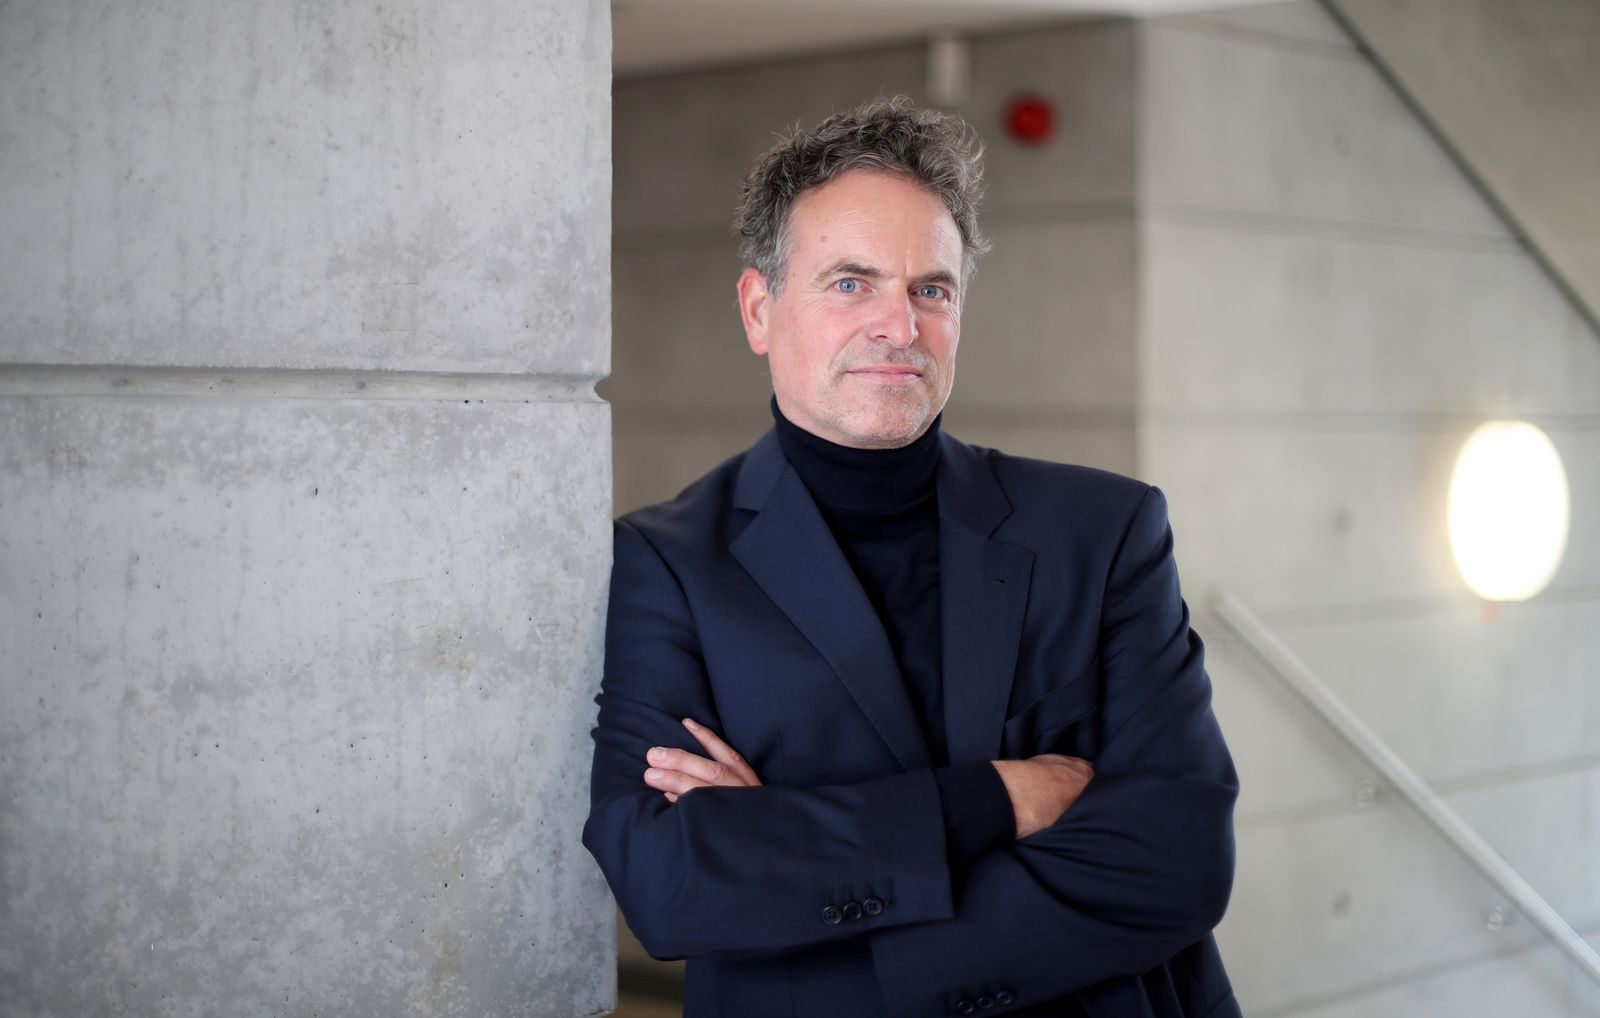 Ingmar Hoerr, founder of CureVac AG, receives Medal of Honour of the Medical Faculty